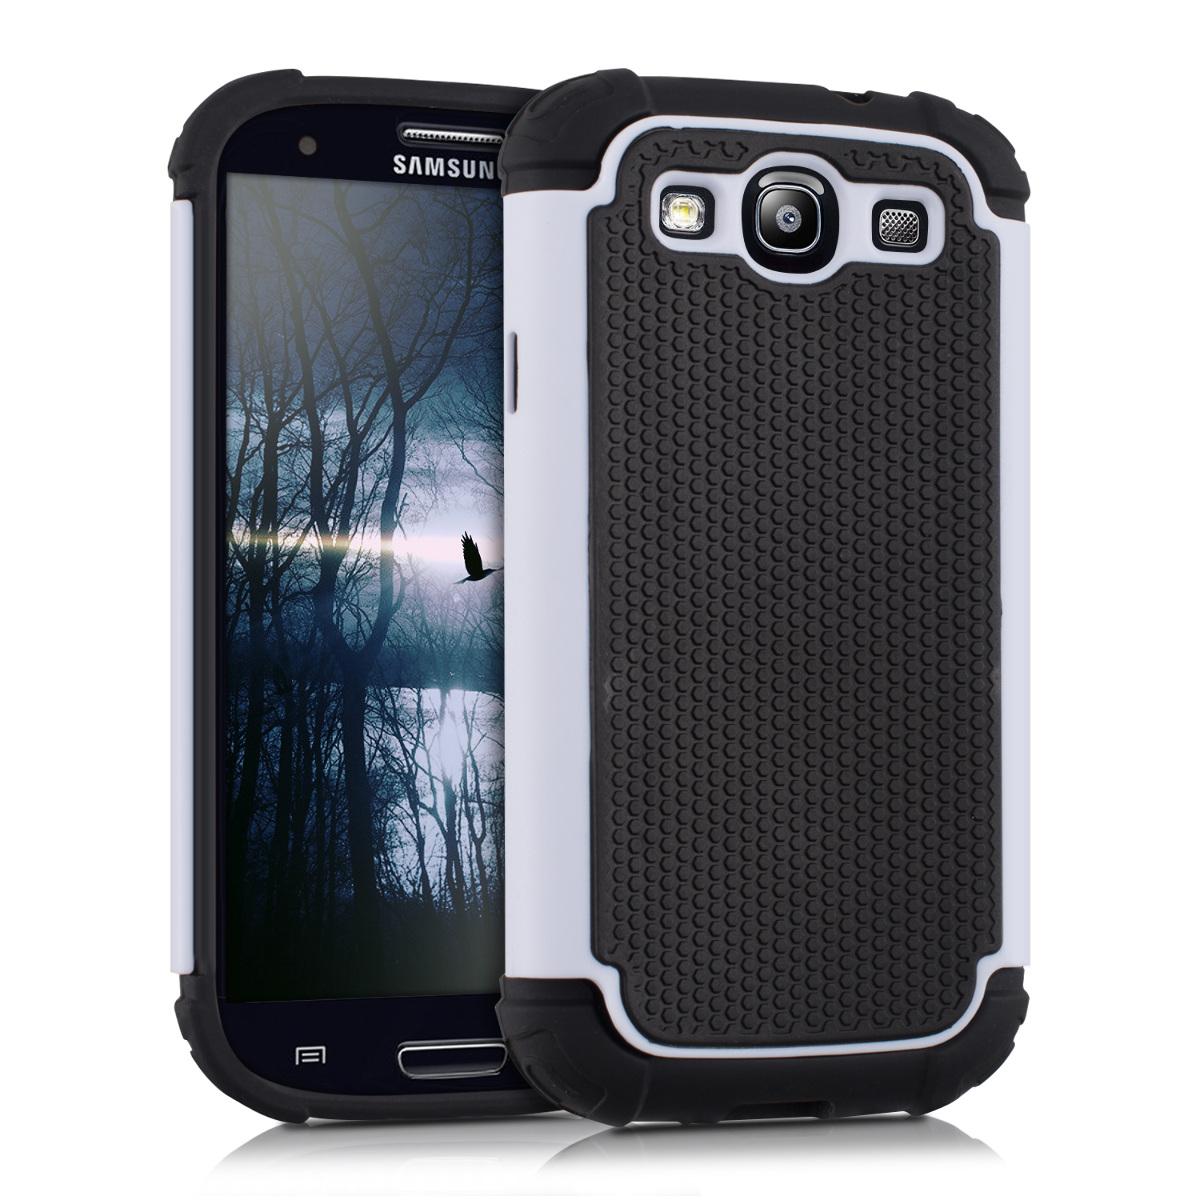 Tpu samsung galaxy s3 s3 neo - Hybrid Case For Samsung Galaxy S3 S3 Neo